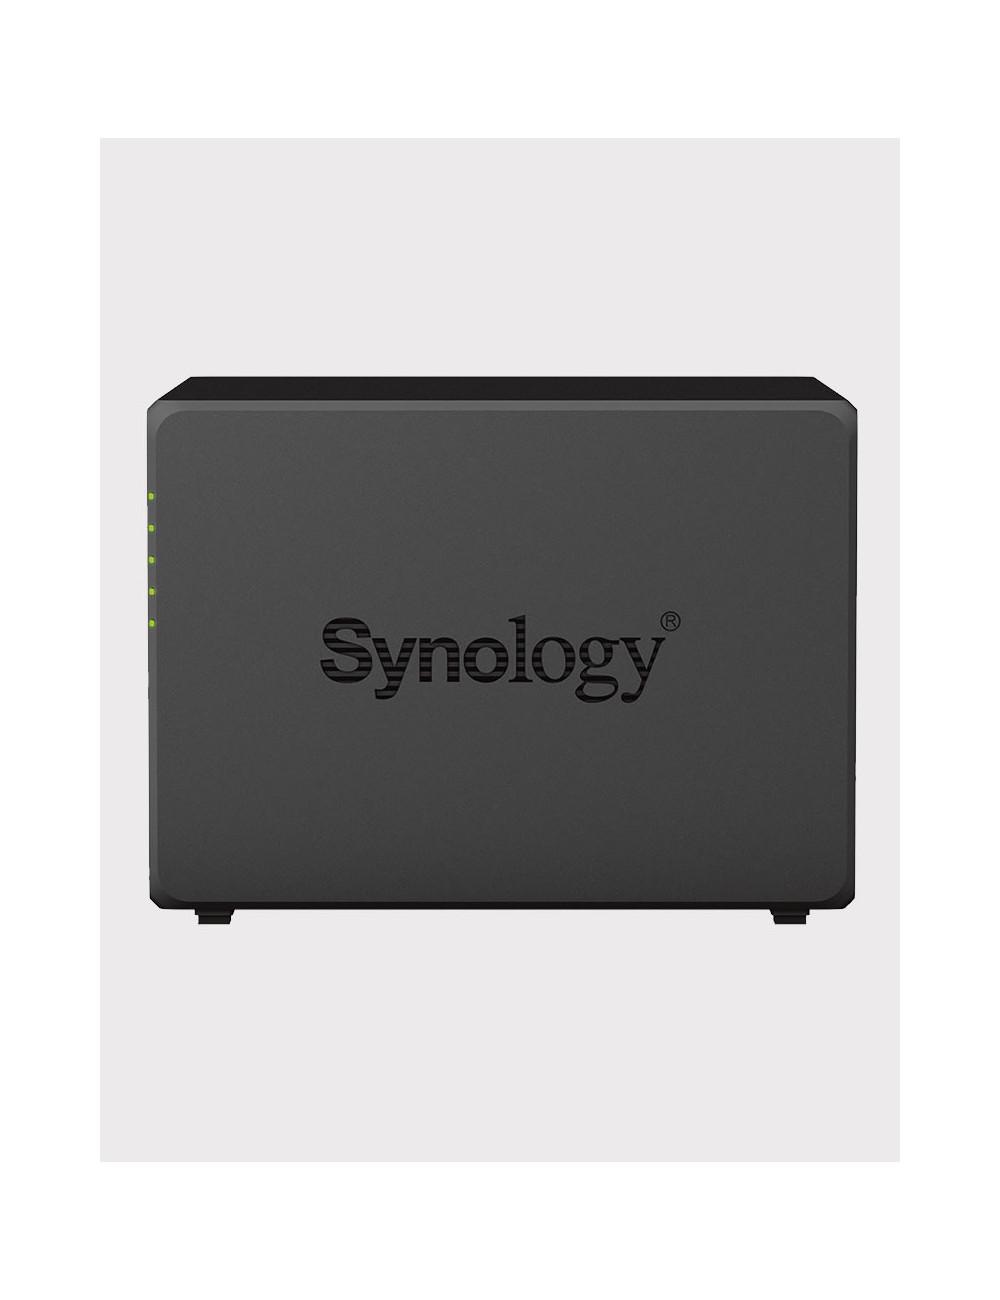 Maintenance anticipé J+1 - 1 an - Firewall AP232/AP234